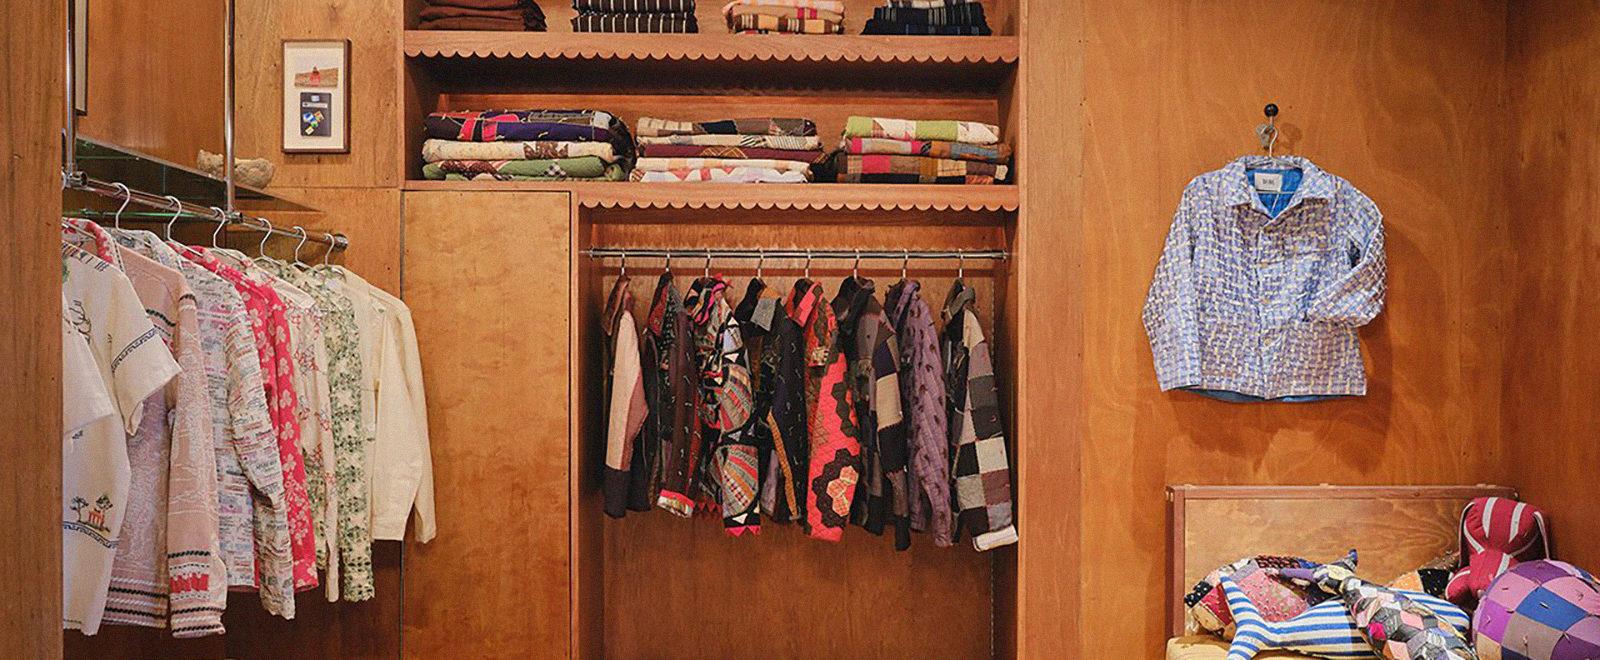 Lower East Side New York shopping Boutique Designer Bode Maryam Nassir Zadeh Assembly Only NY Eckhaus Latta